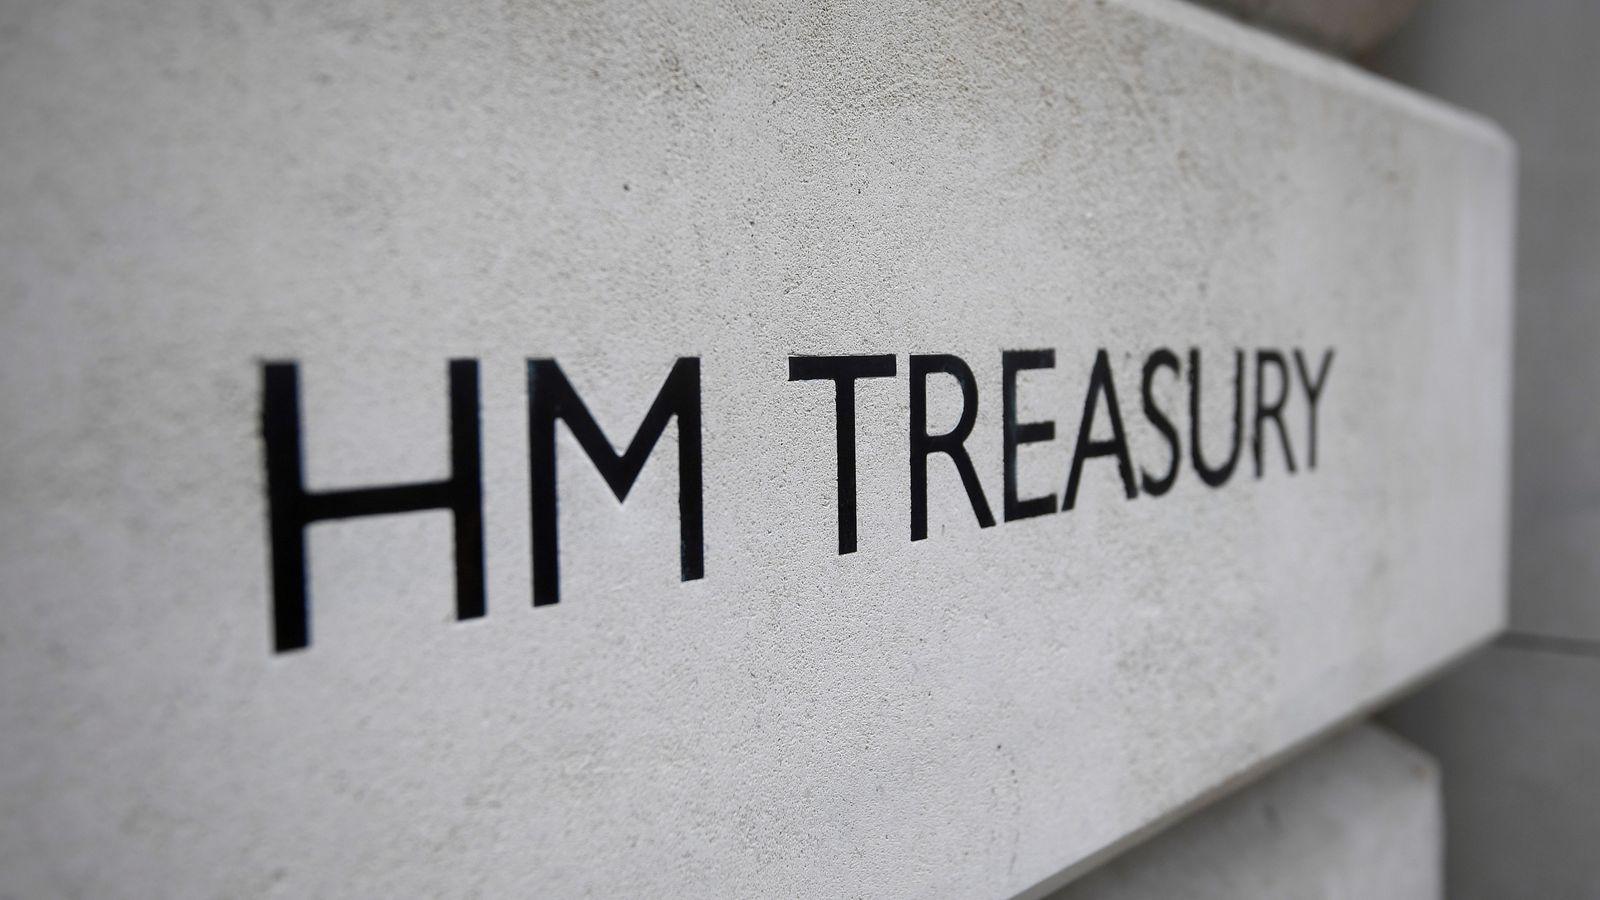 Coronavirus: Treasury axes plan for emergency supply chain finance scheme   Business News